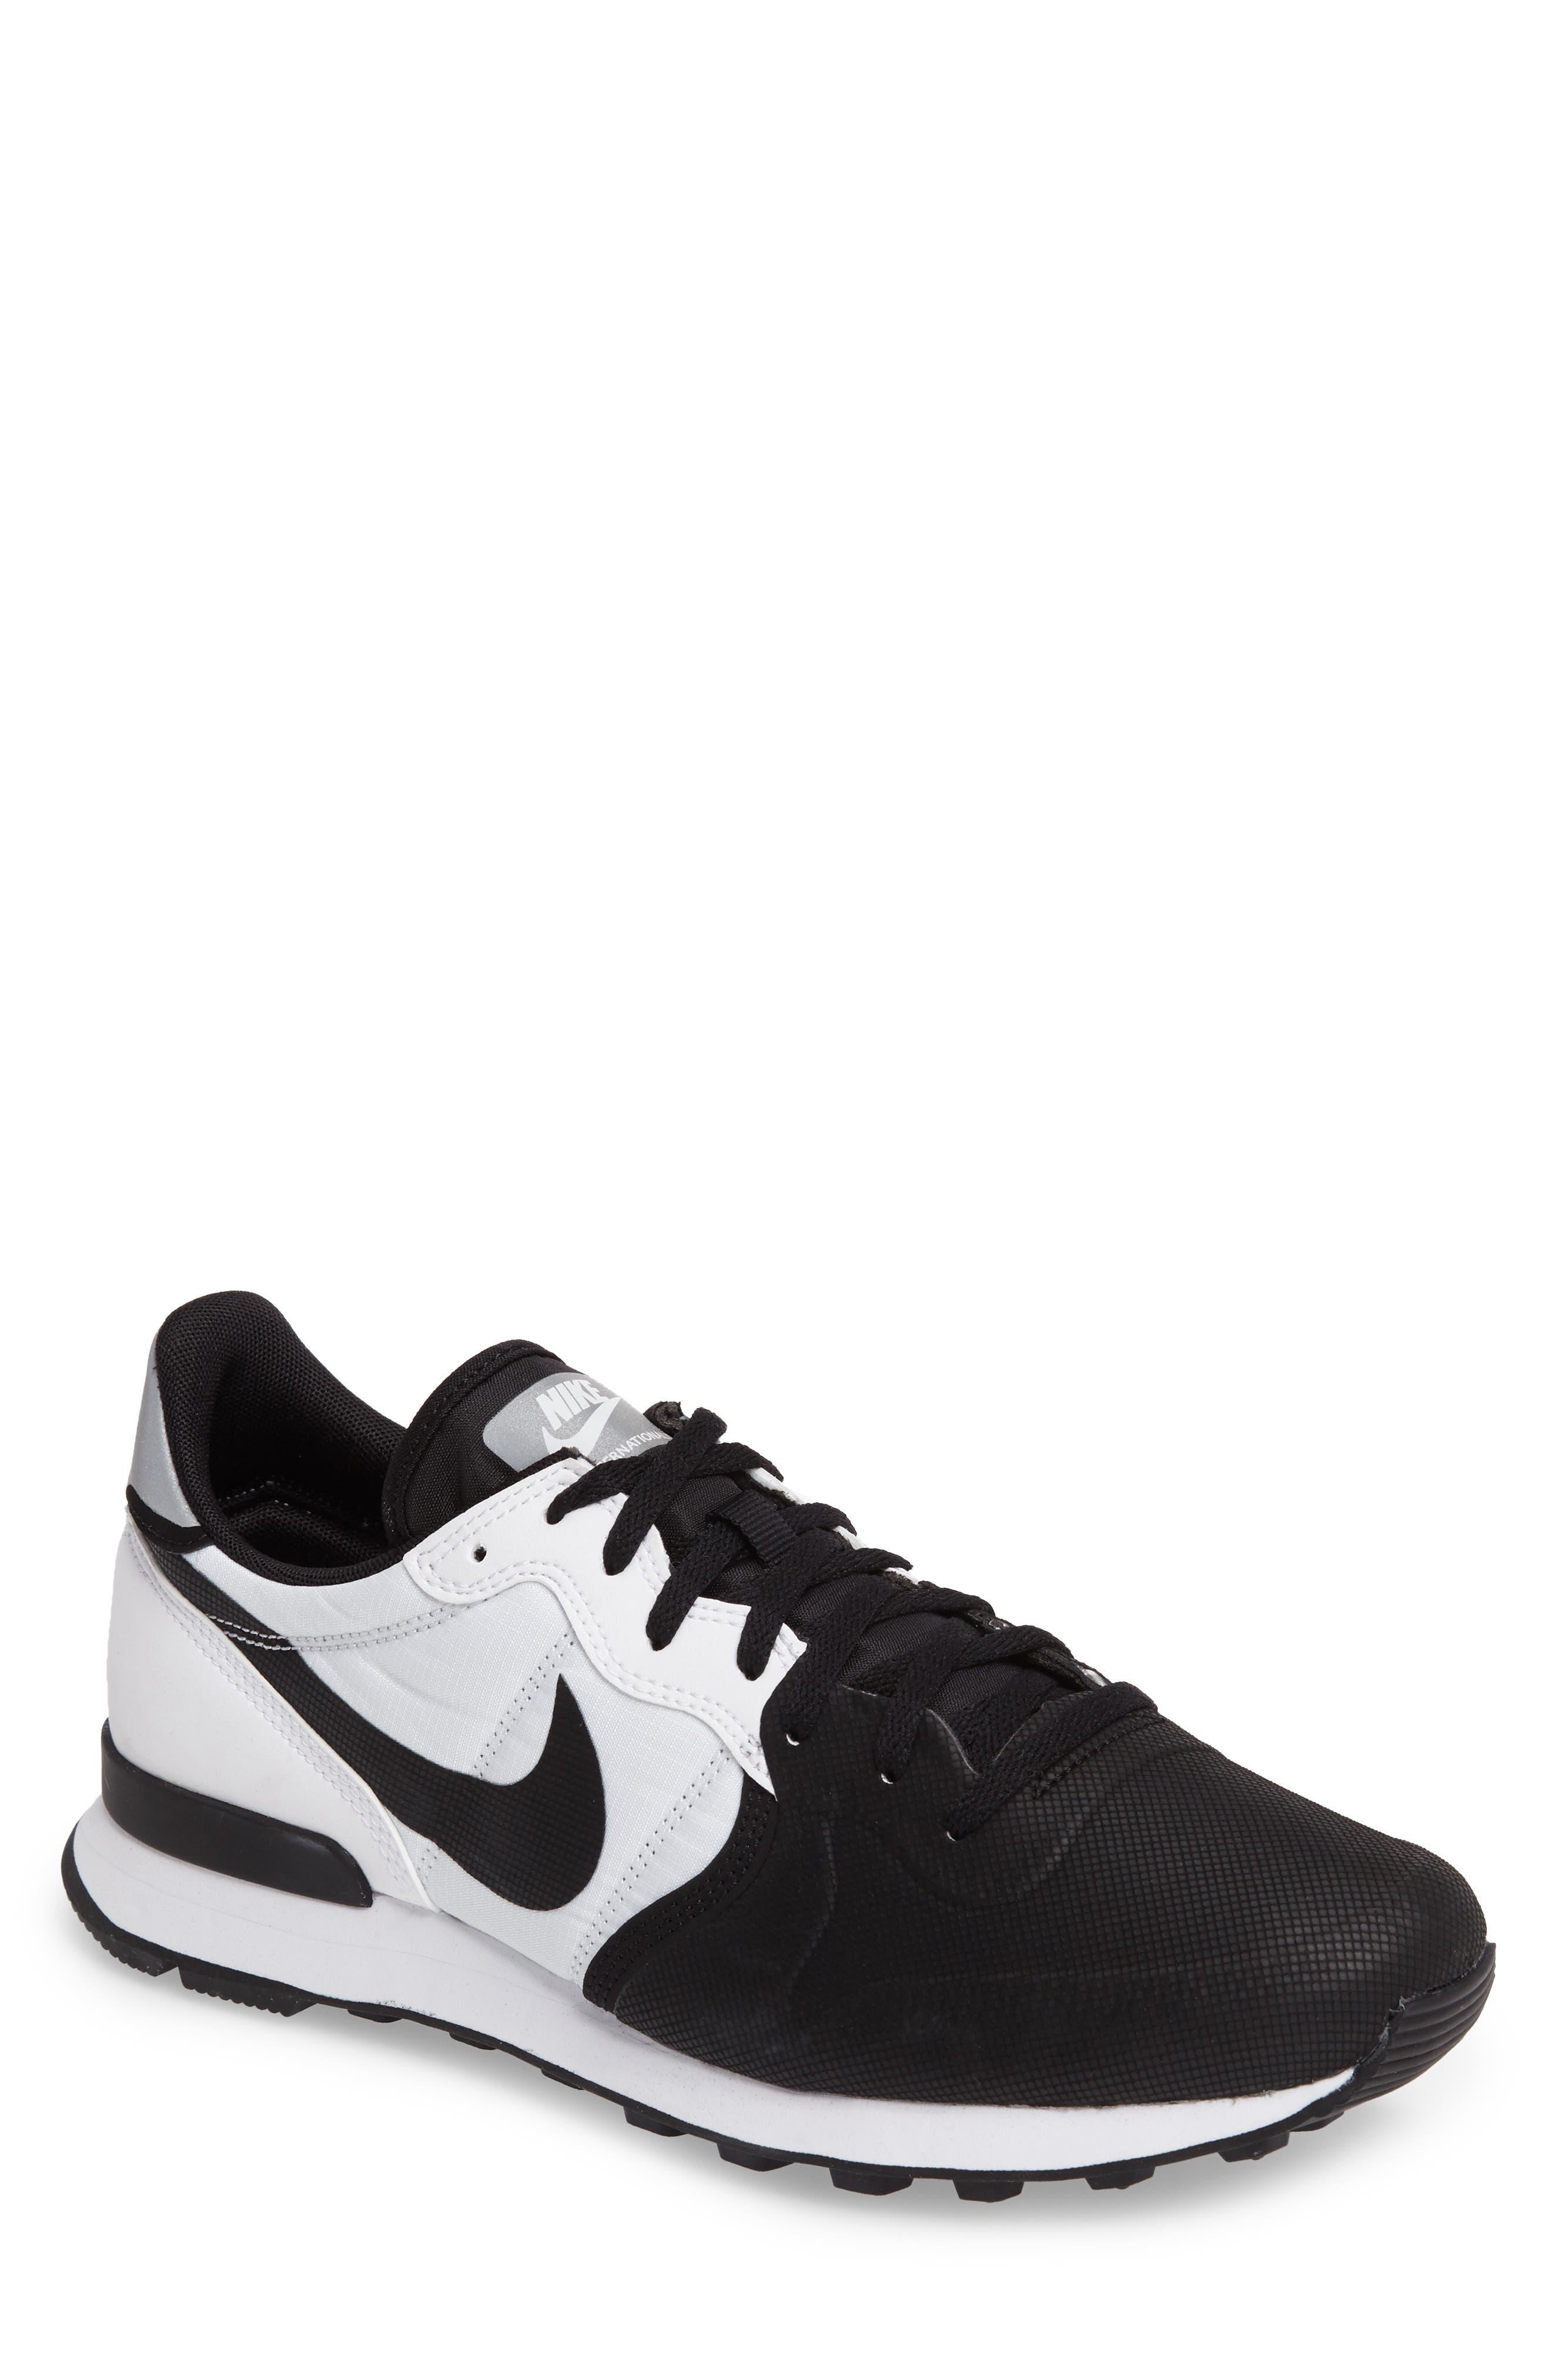 NIKE Internationalist Premium SE Sneaker